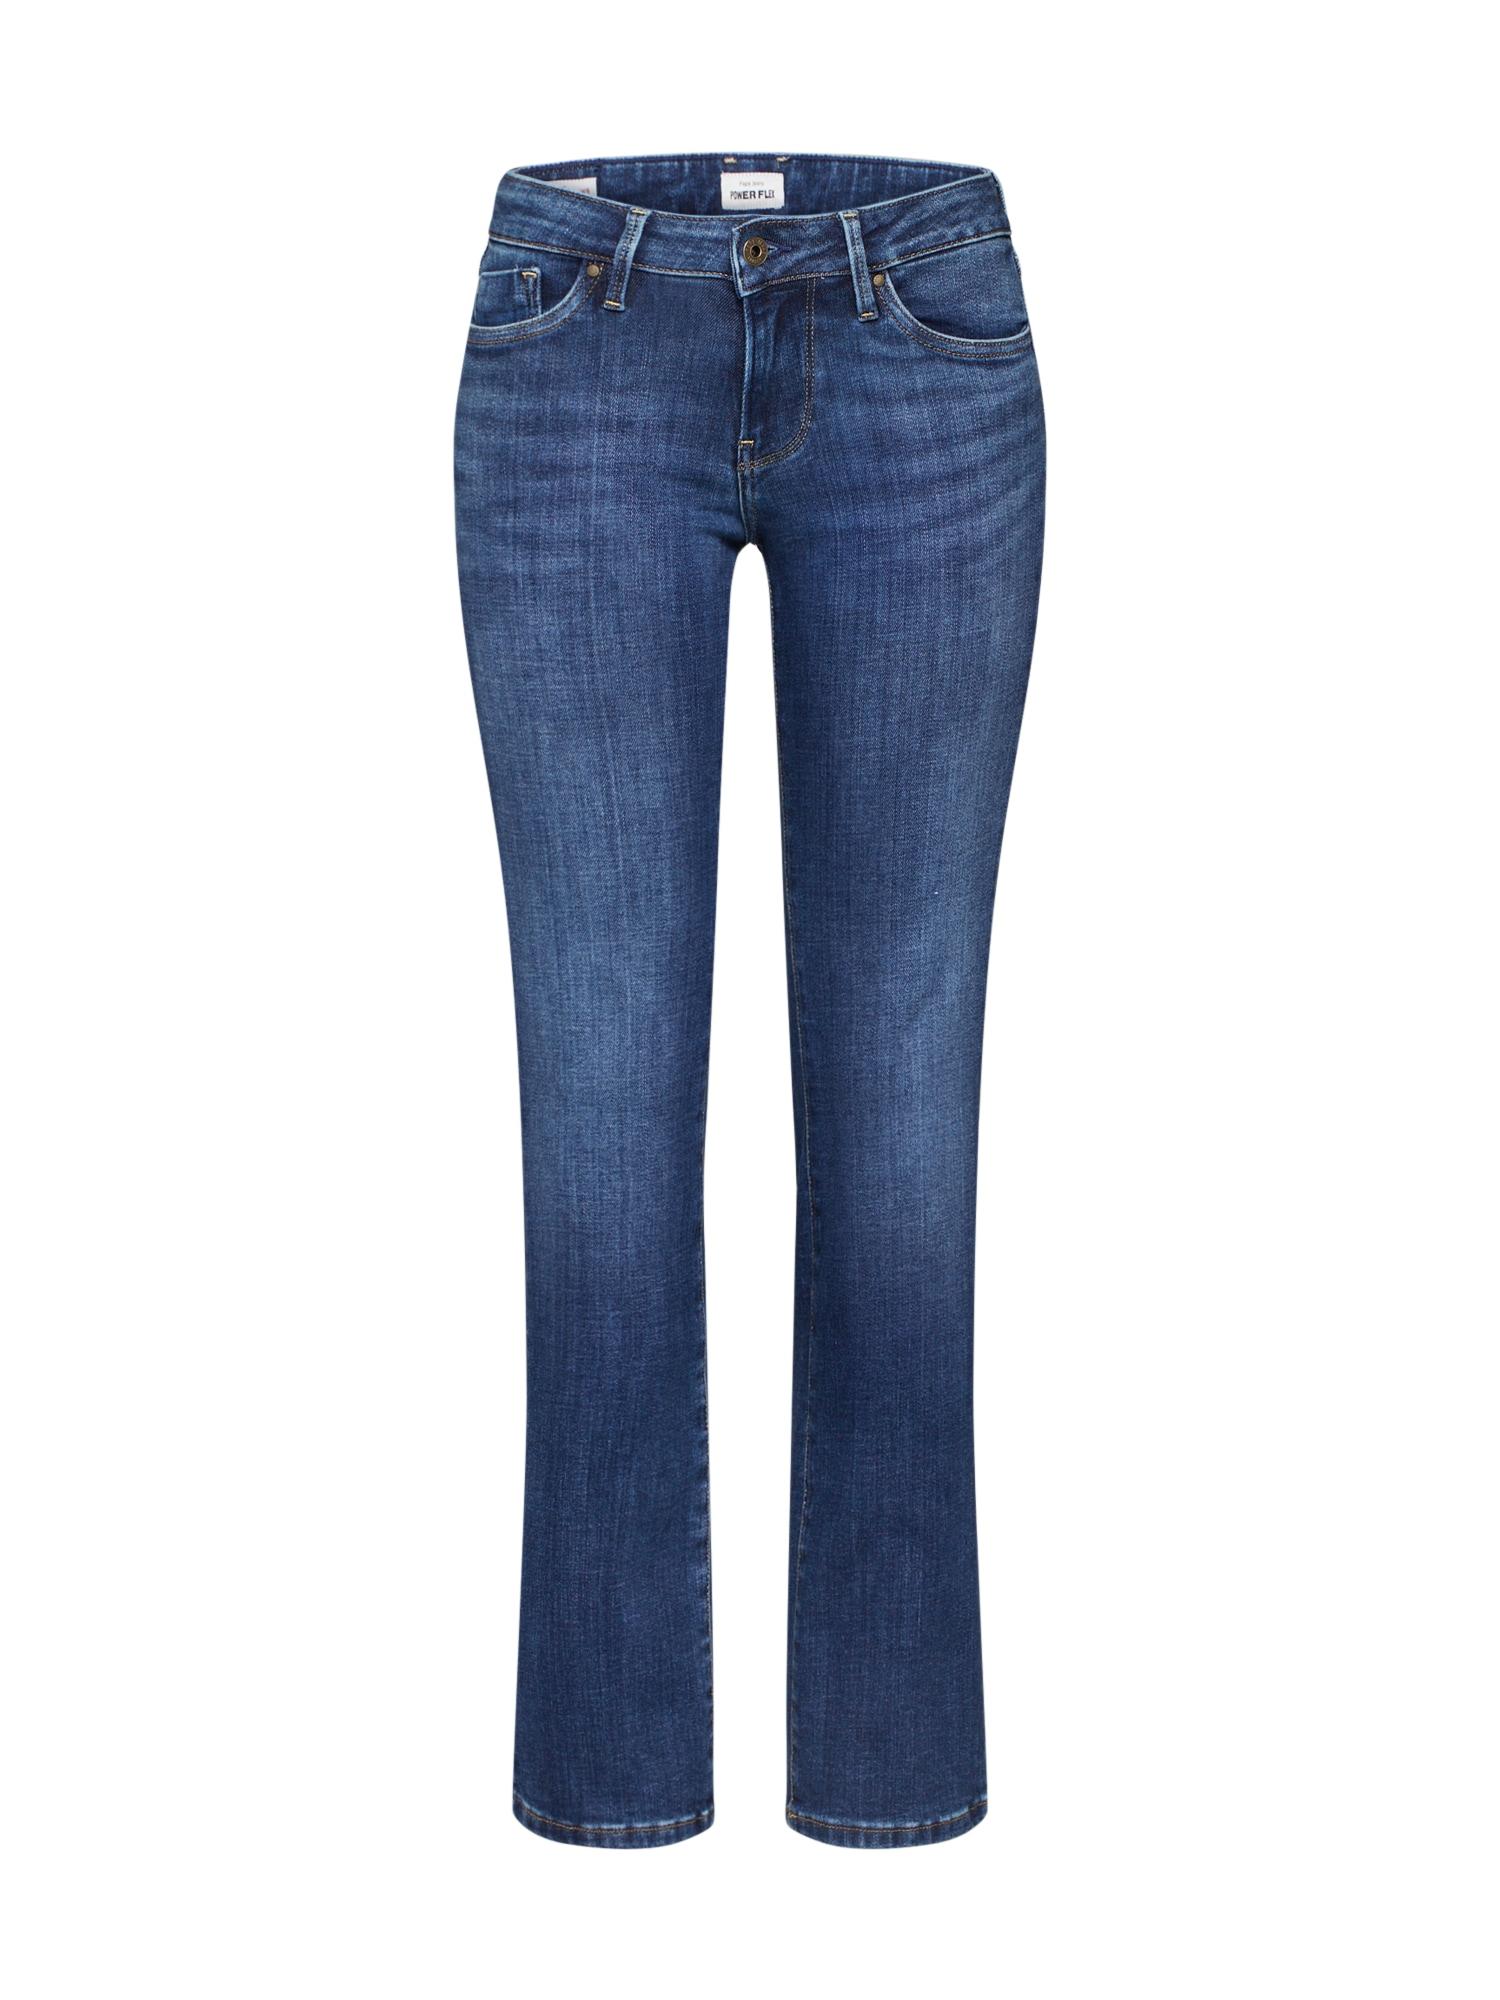 Pepe Jeans Džínsy 'Piccadilly'  modrá denim